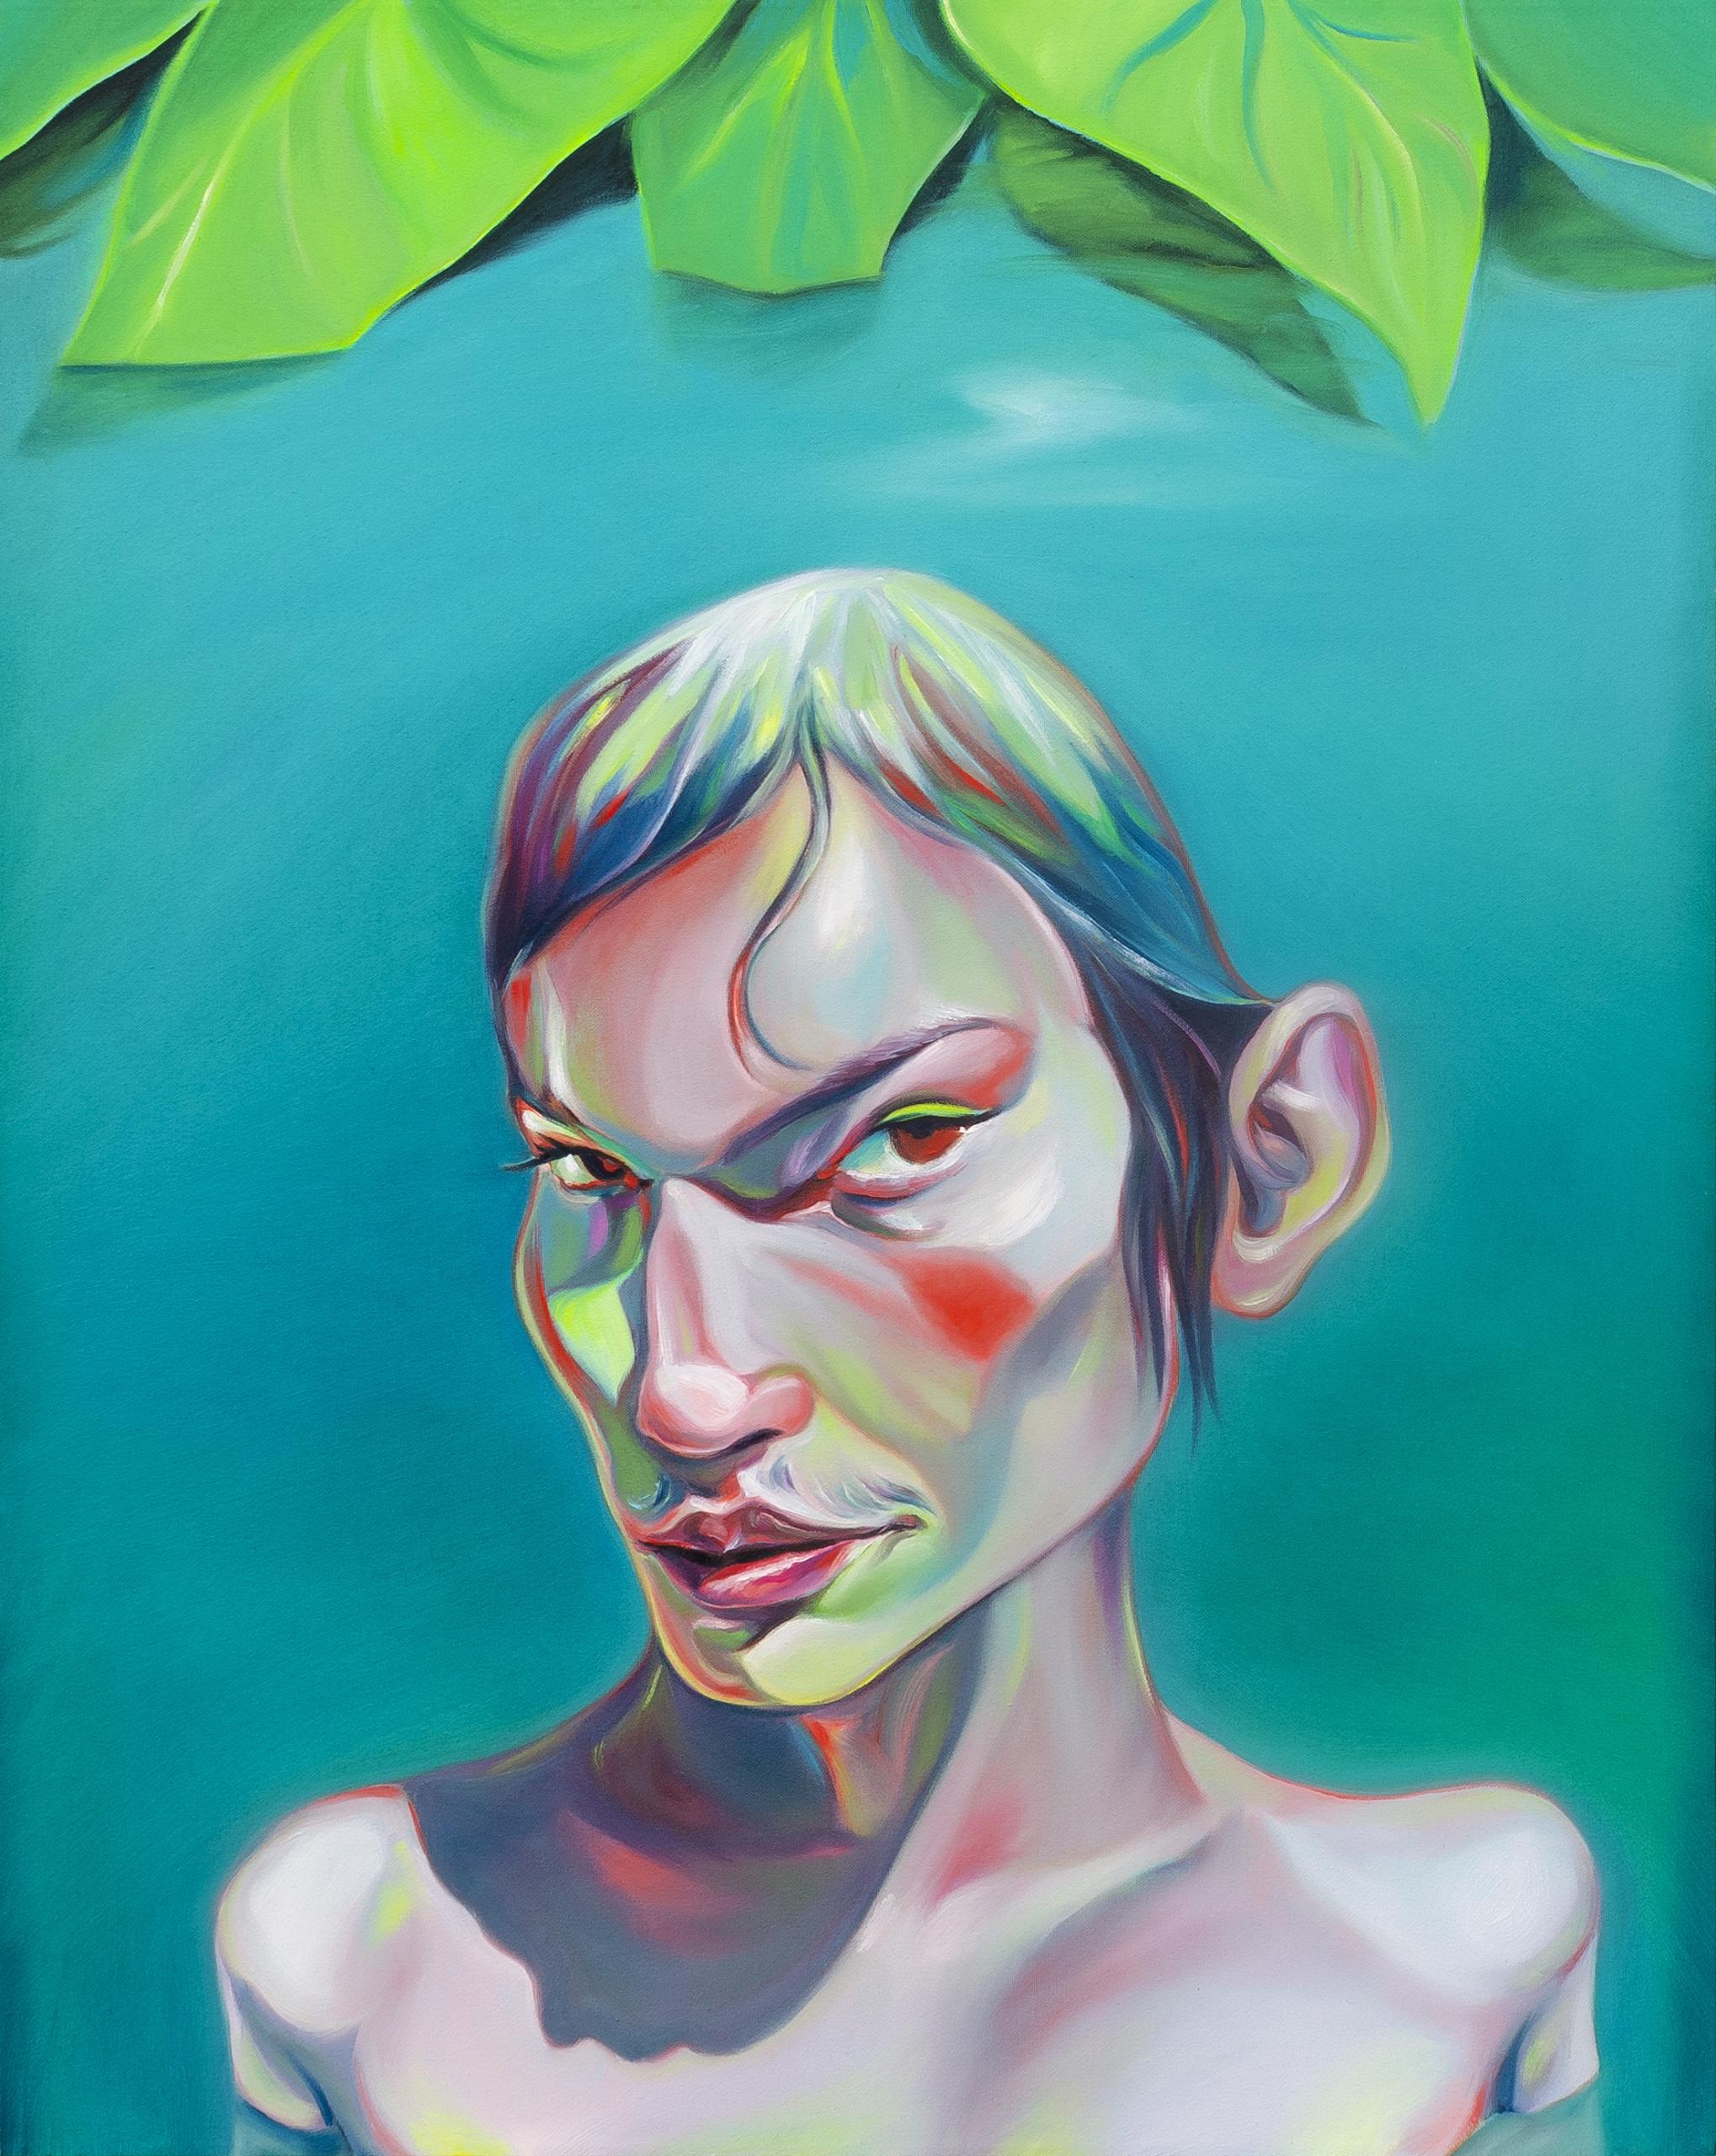 Luigi Presicce - Homo Sapiens Sapiens Sapiens (Ragazza che prende il bagno) - 2020 - Olio su tela - 100x80cm - fot_n_ 2396 - Cod_15Pre2020